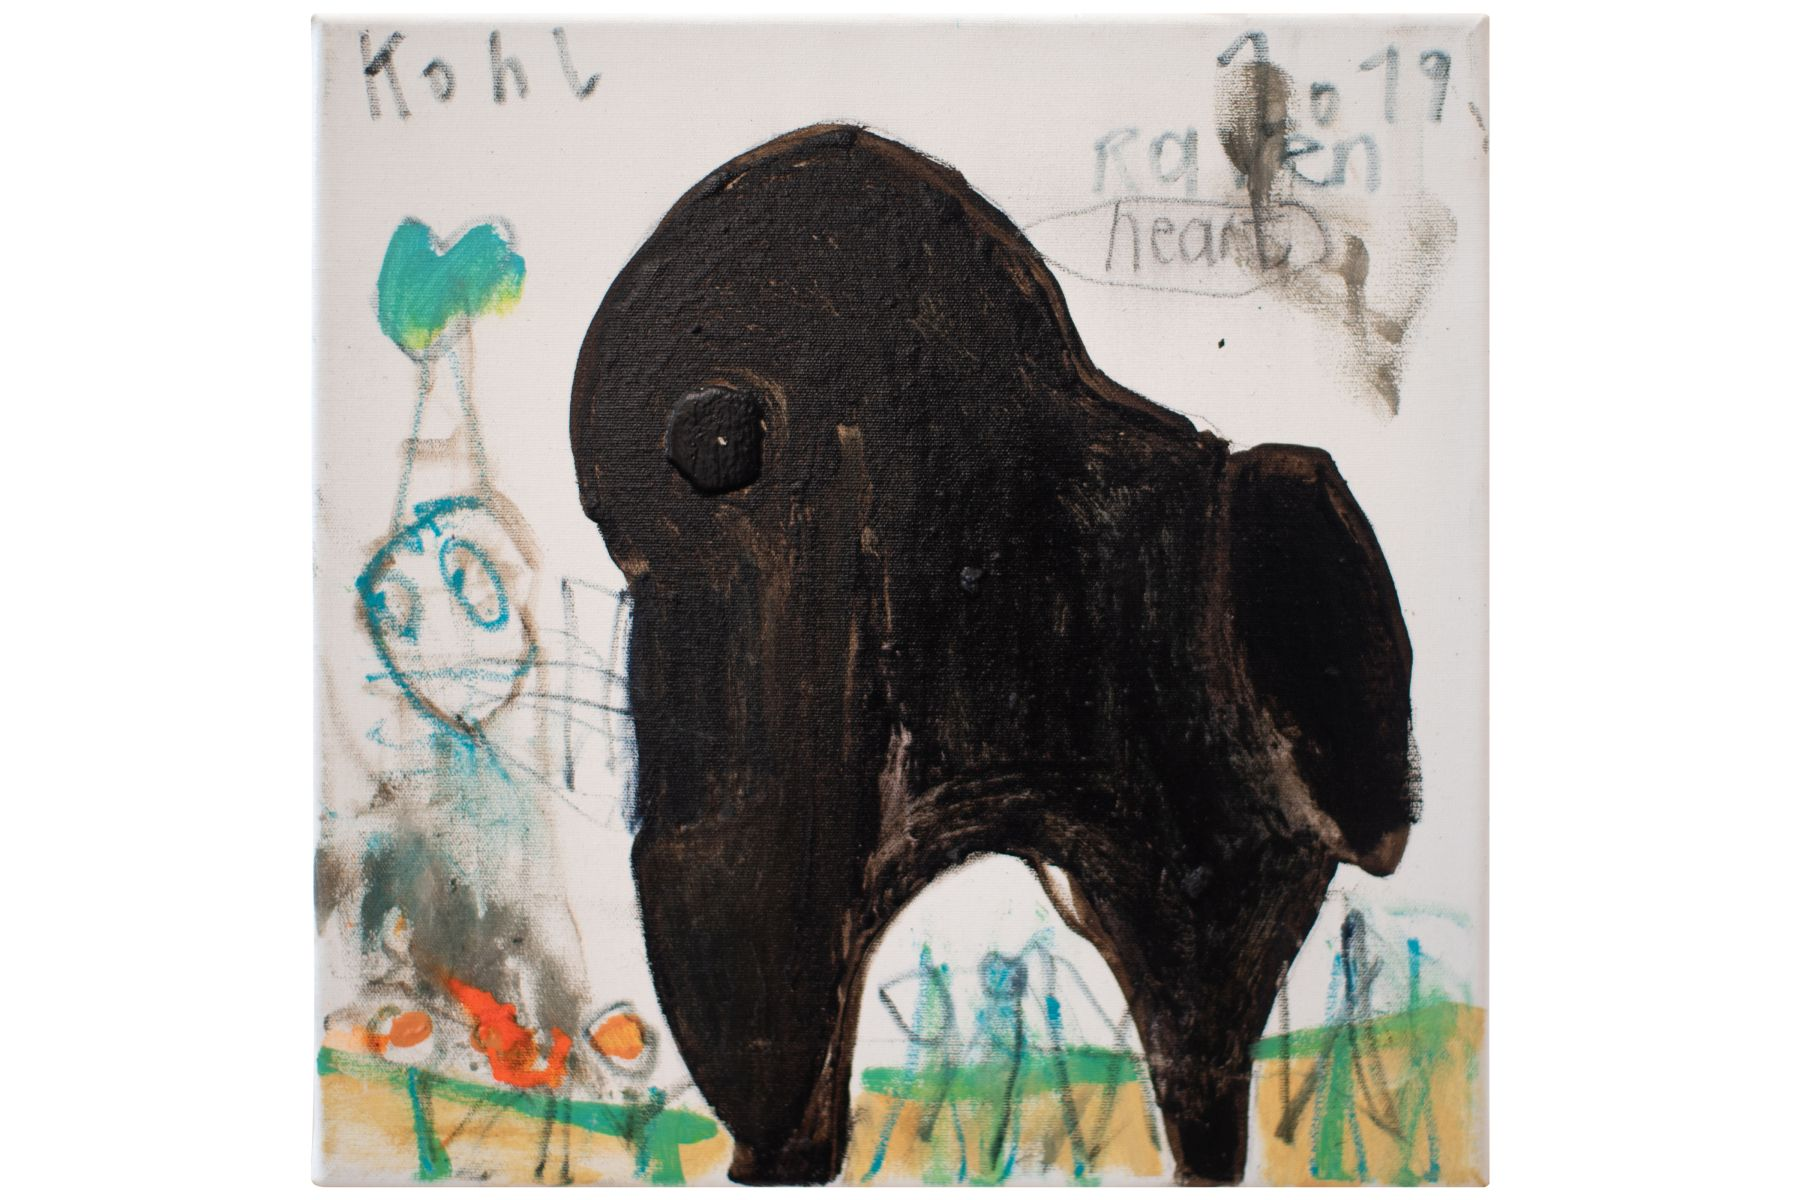 "#49 Peter Kohl (1971) ""Raven heart"" | Peter Kohl (1971) ""Raben heart"" Image"